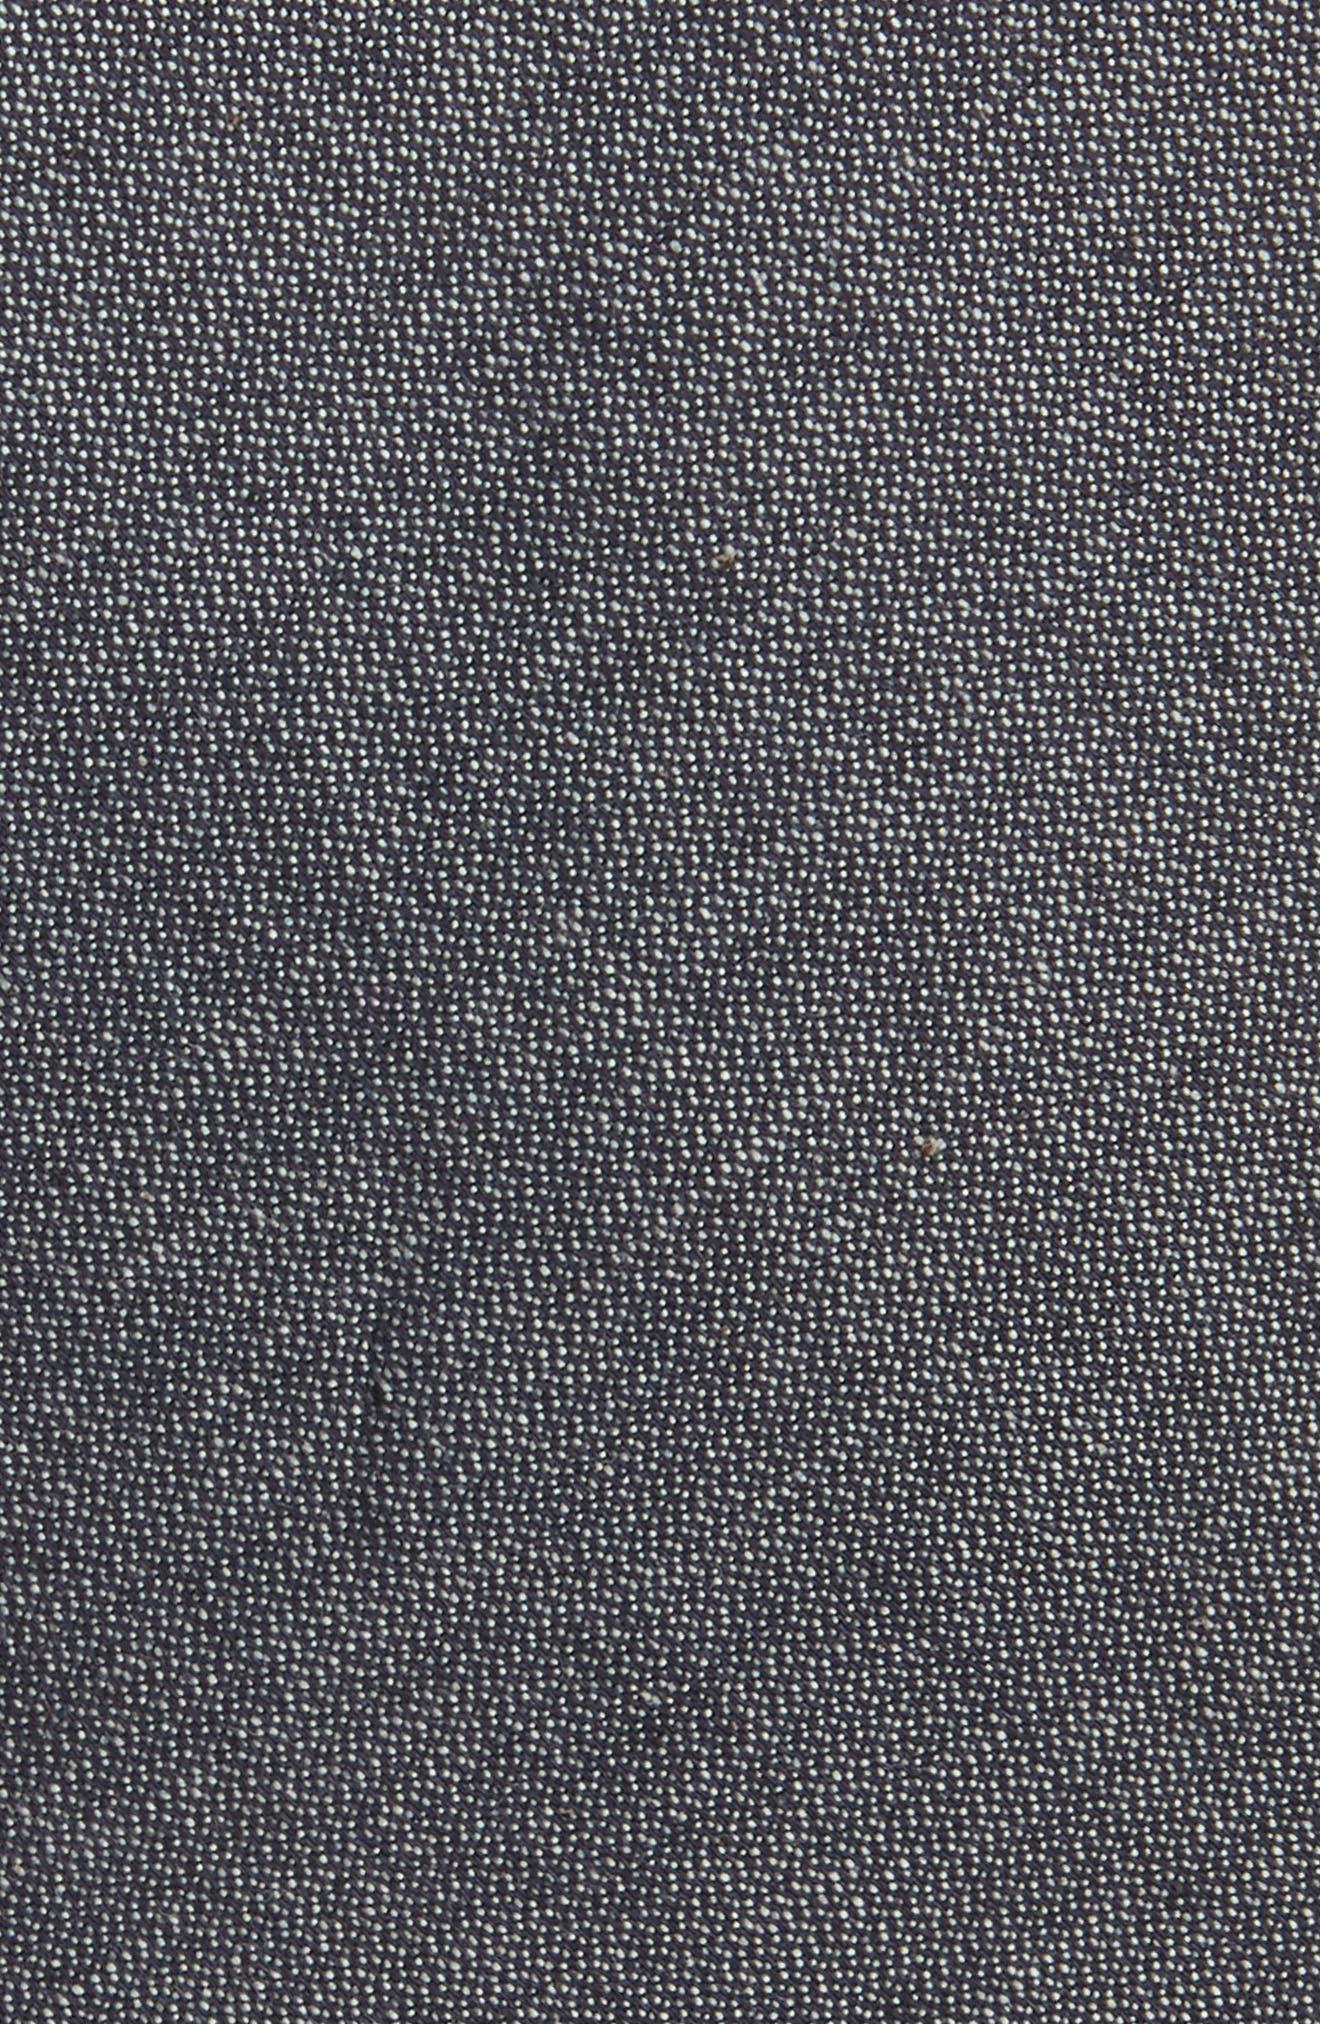 Solid Cotton Tie,                             Alternate thumbnail 2, color,